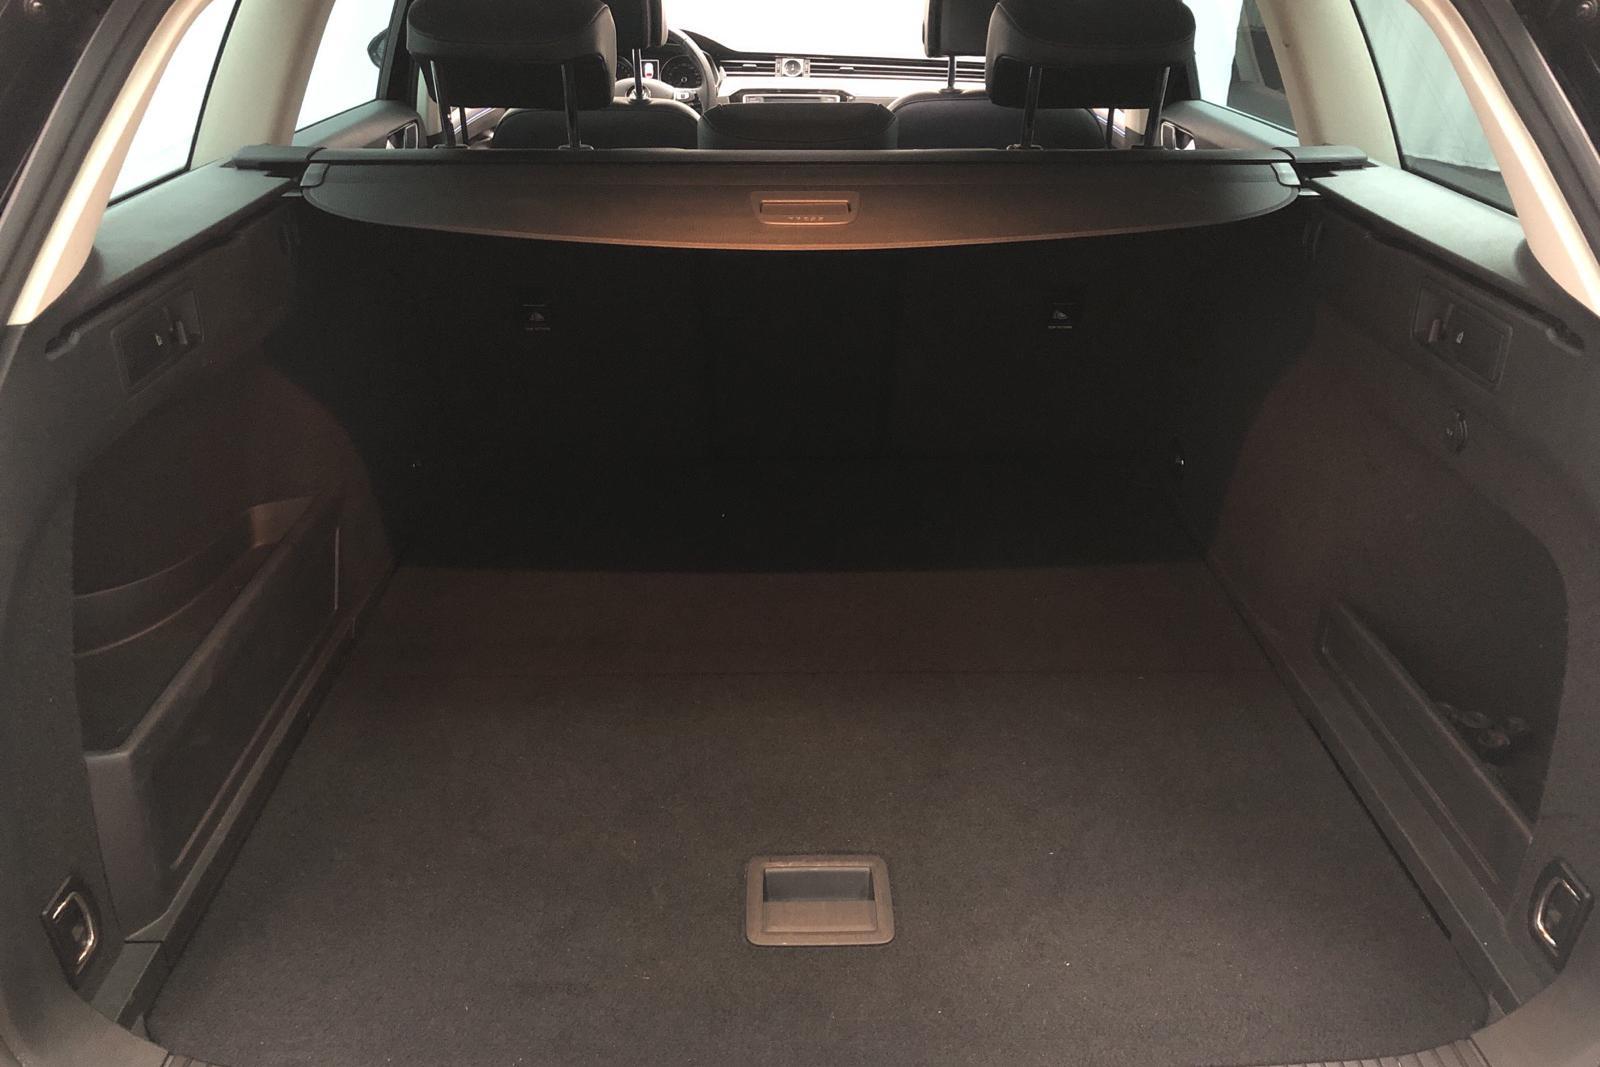 VW Passat 1.4 GTE Plug-in-Hybrid Sportscombi (218hk) - 41 650 km - Automatic - black - 2017